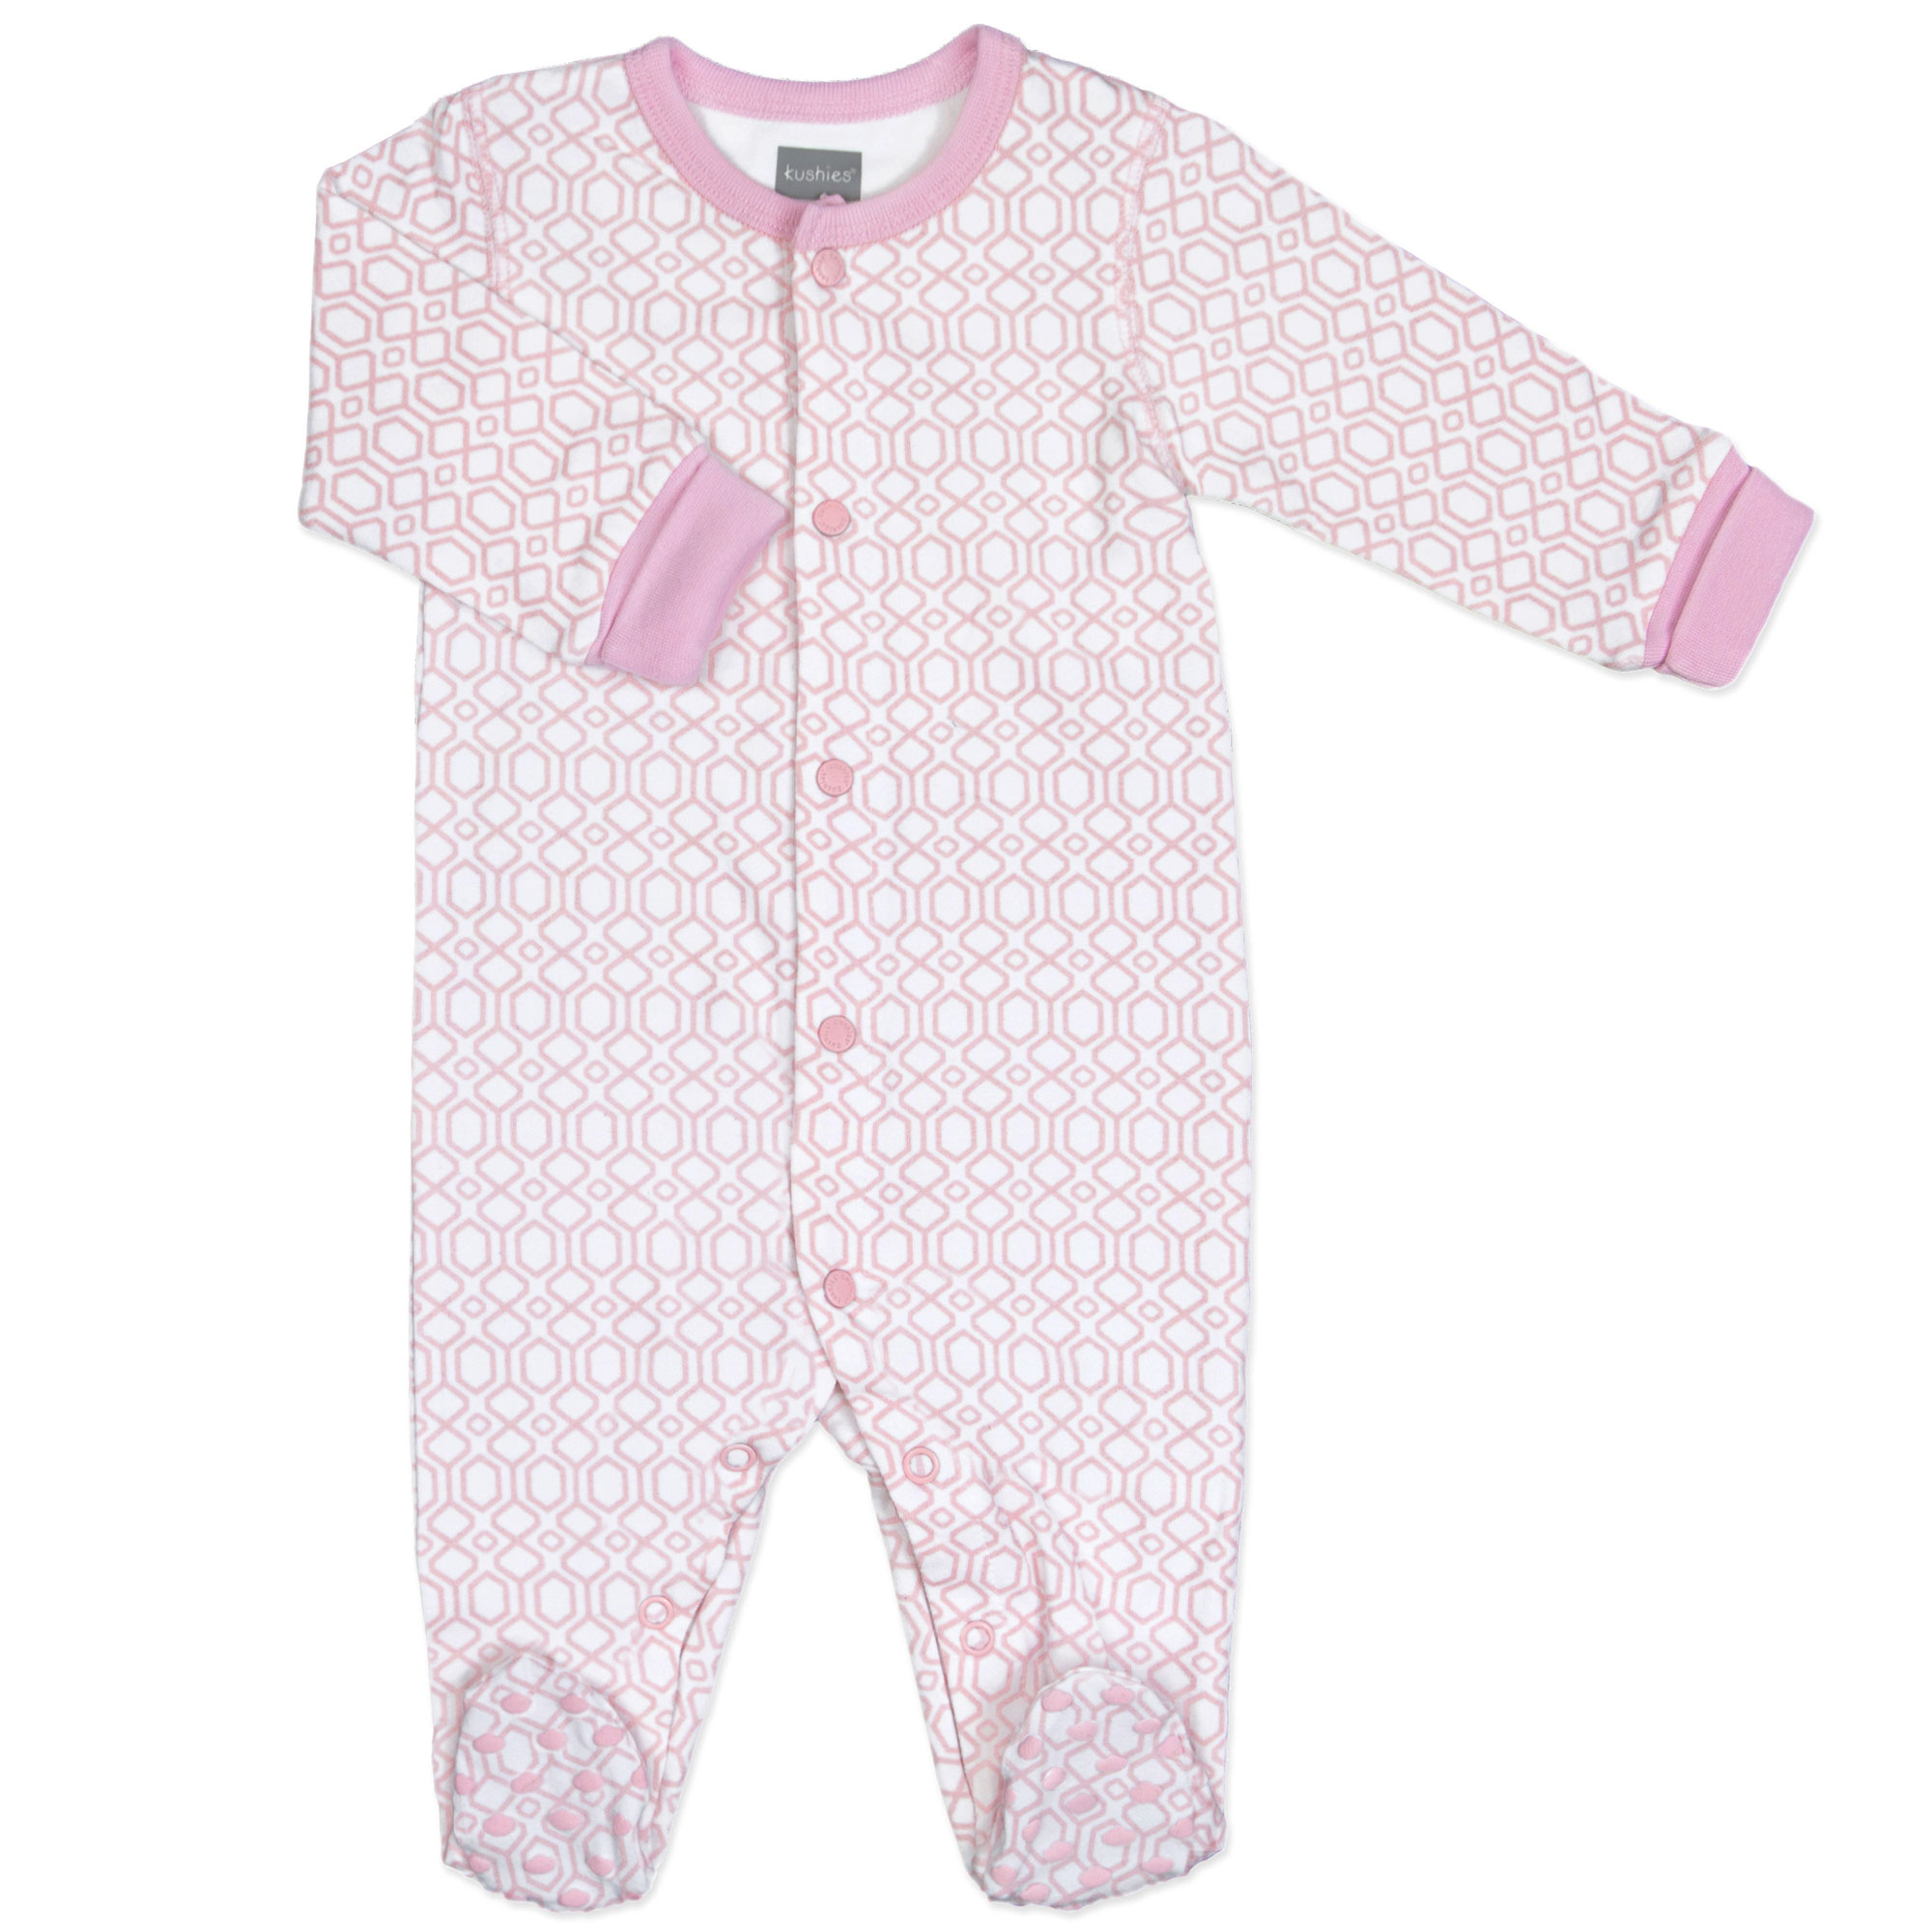 LITTLE WONDER Toddler Boy girl NEWBORN up to 8 LB  Footed Pajamas SLEEPER